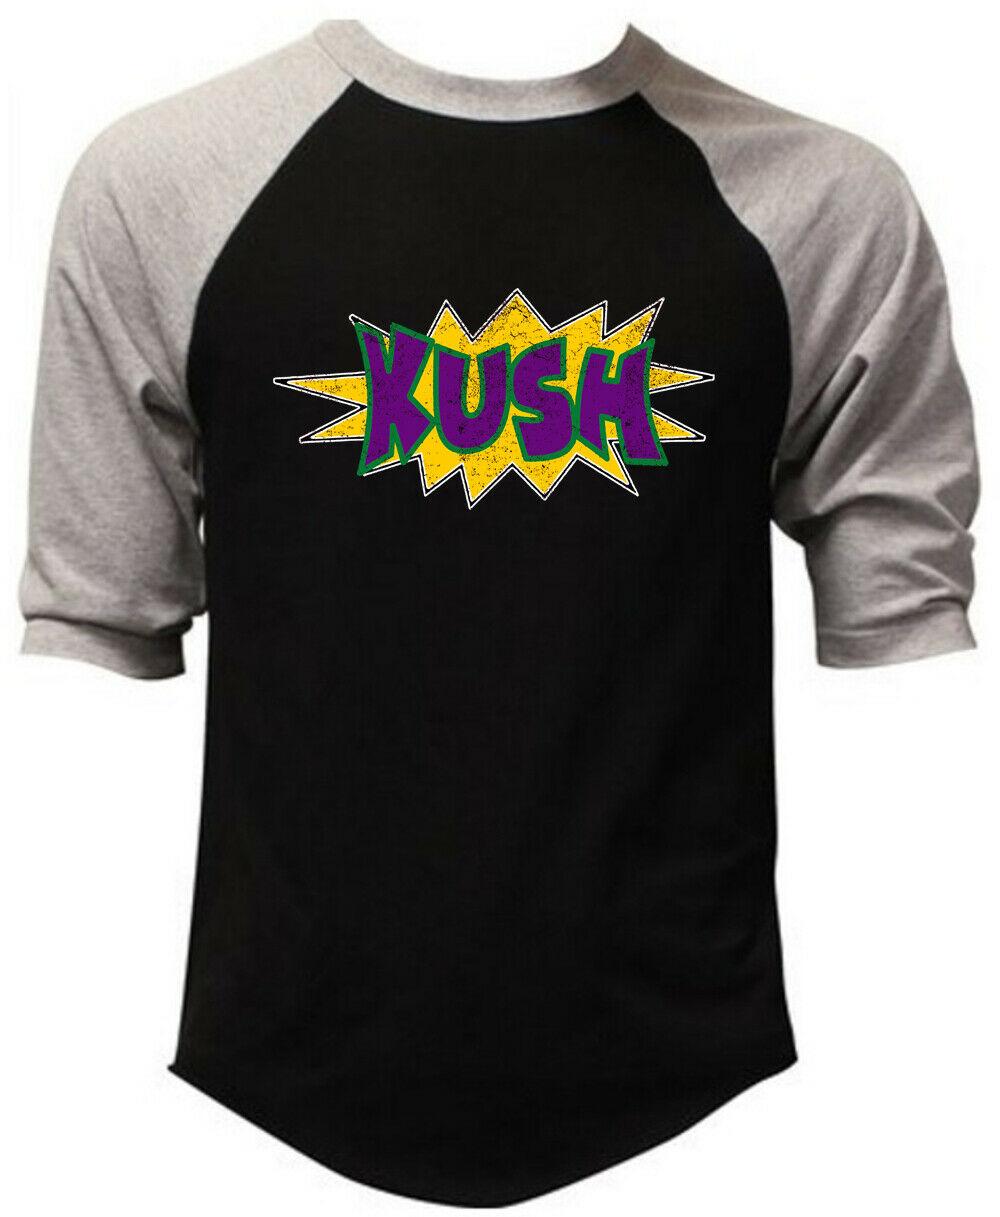 Men's Comic Kush KT T27 Black Baseball Raglan T Shirt Weed high Blunt Marijuana 1